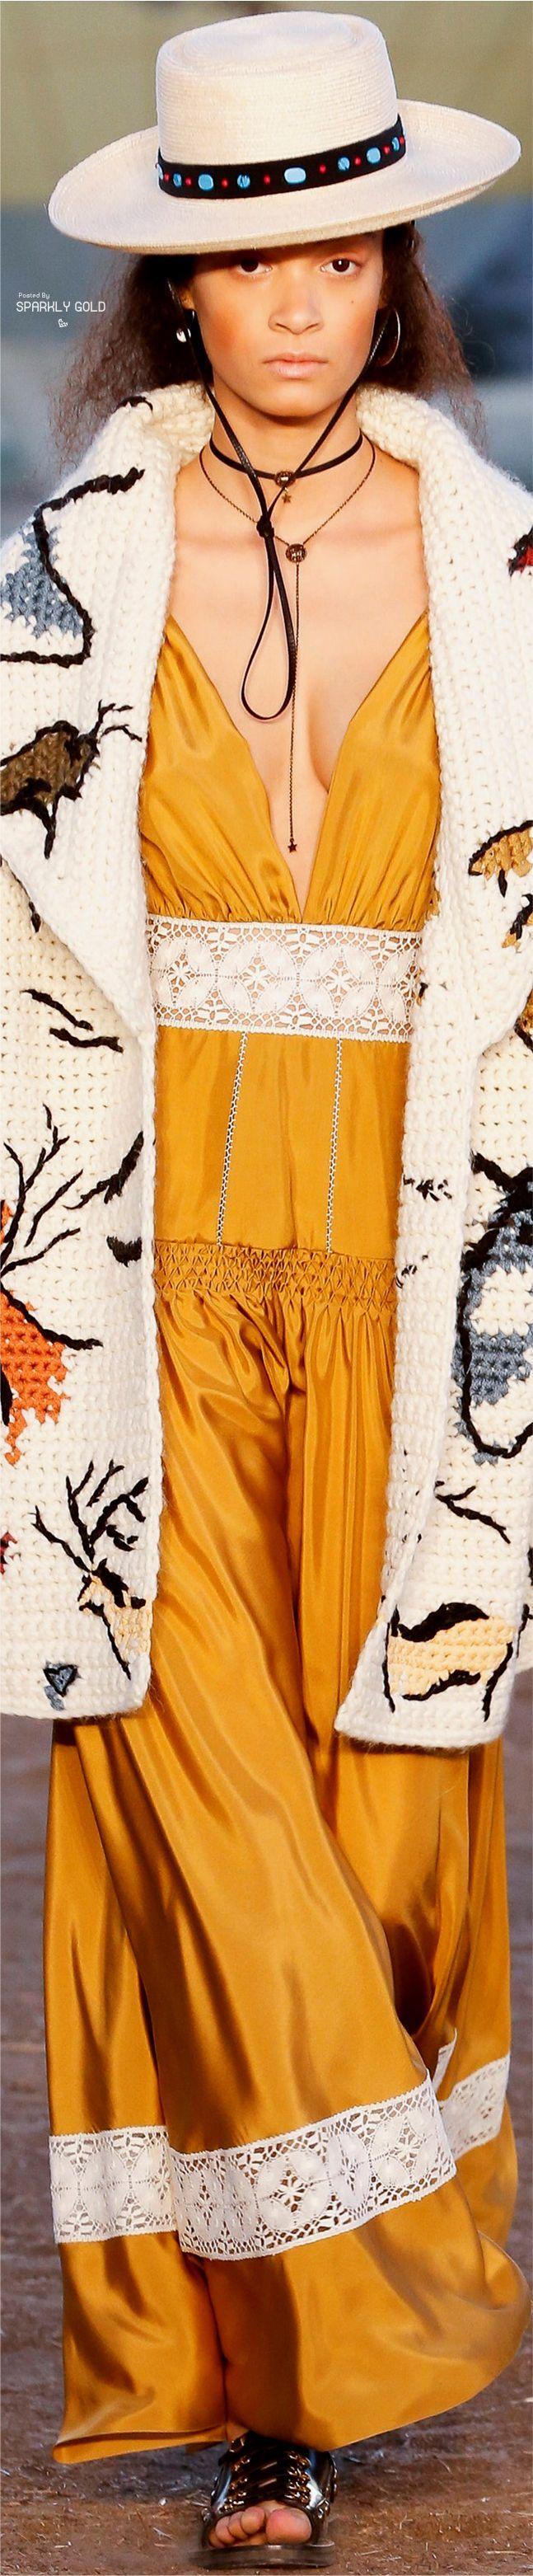 Christian Dior R-18: hat, long crochet cardigan, mustard maxi dress.